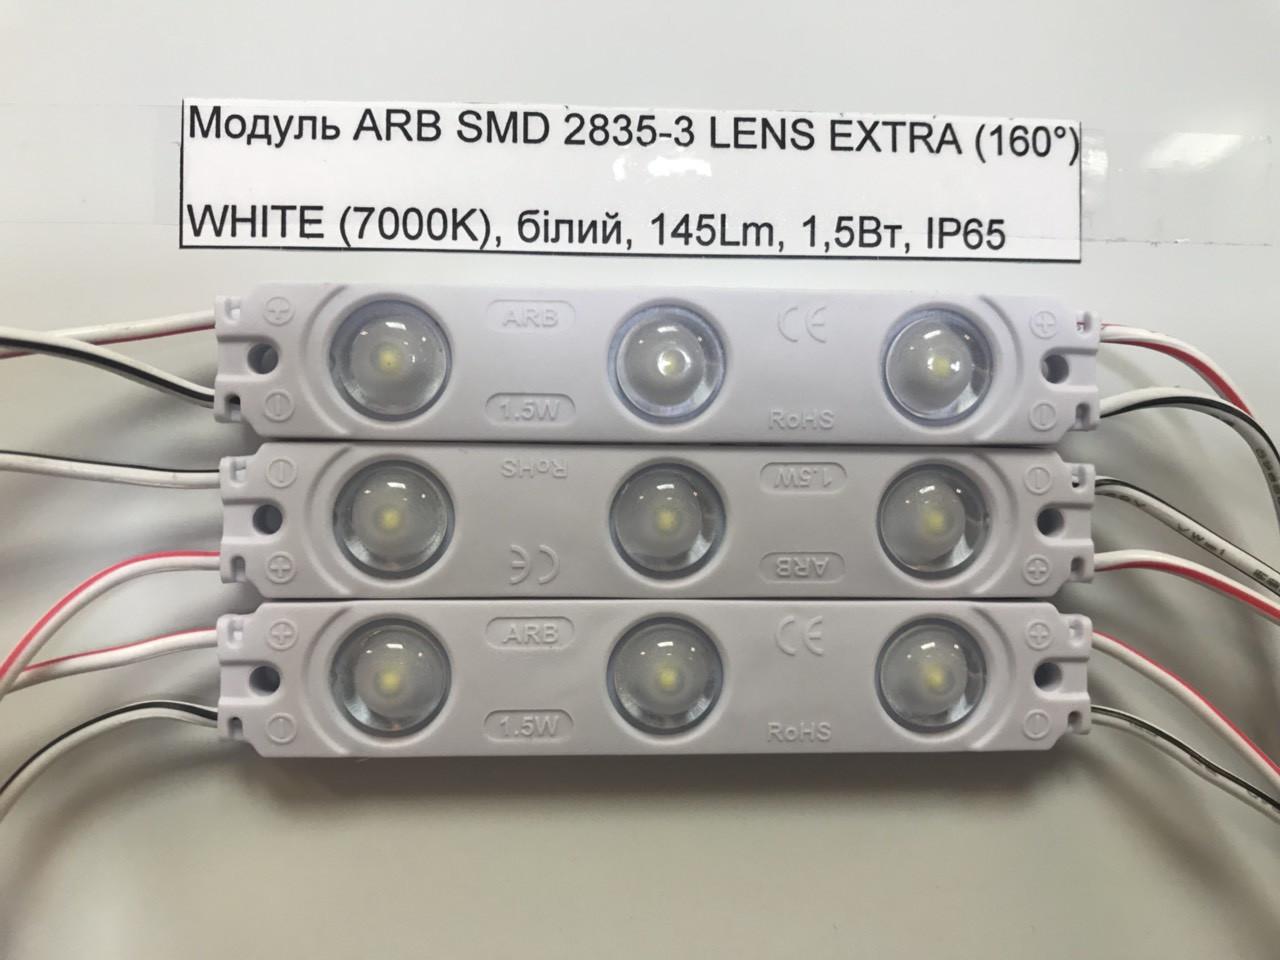 Модуль ARB SMD 2835-3 LENS (160°) WHITE (7000K), білий, 70Lm, 0,72Вт, IP65